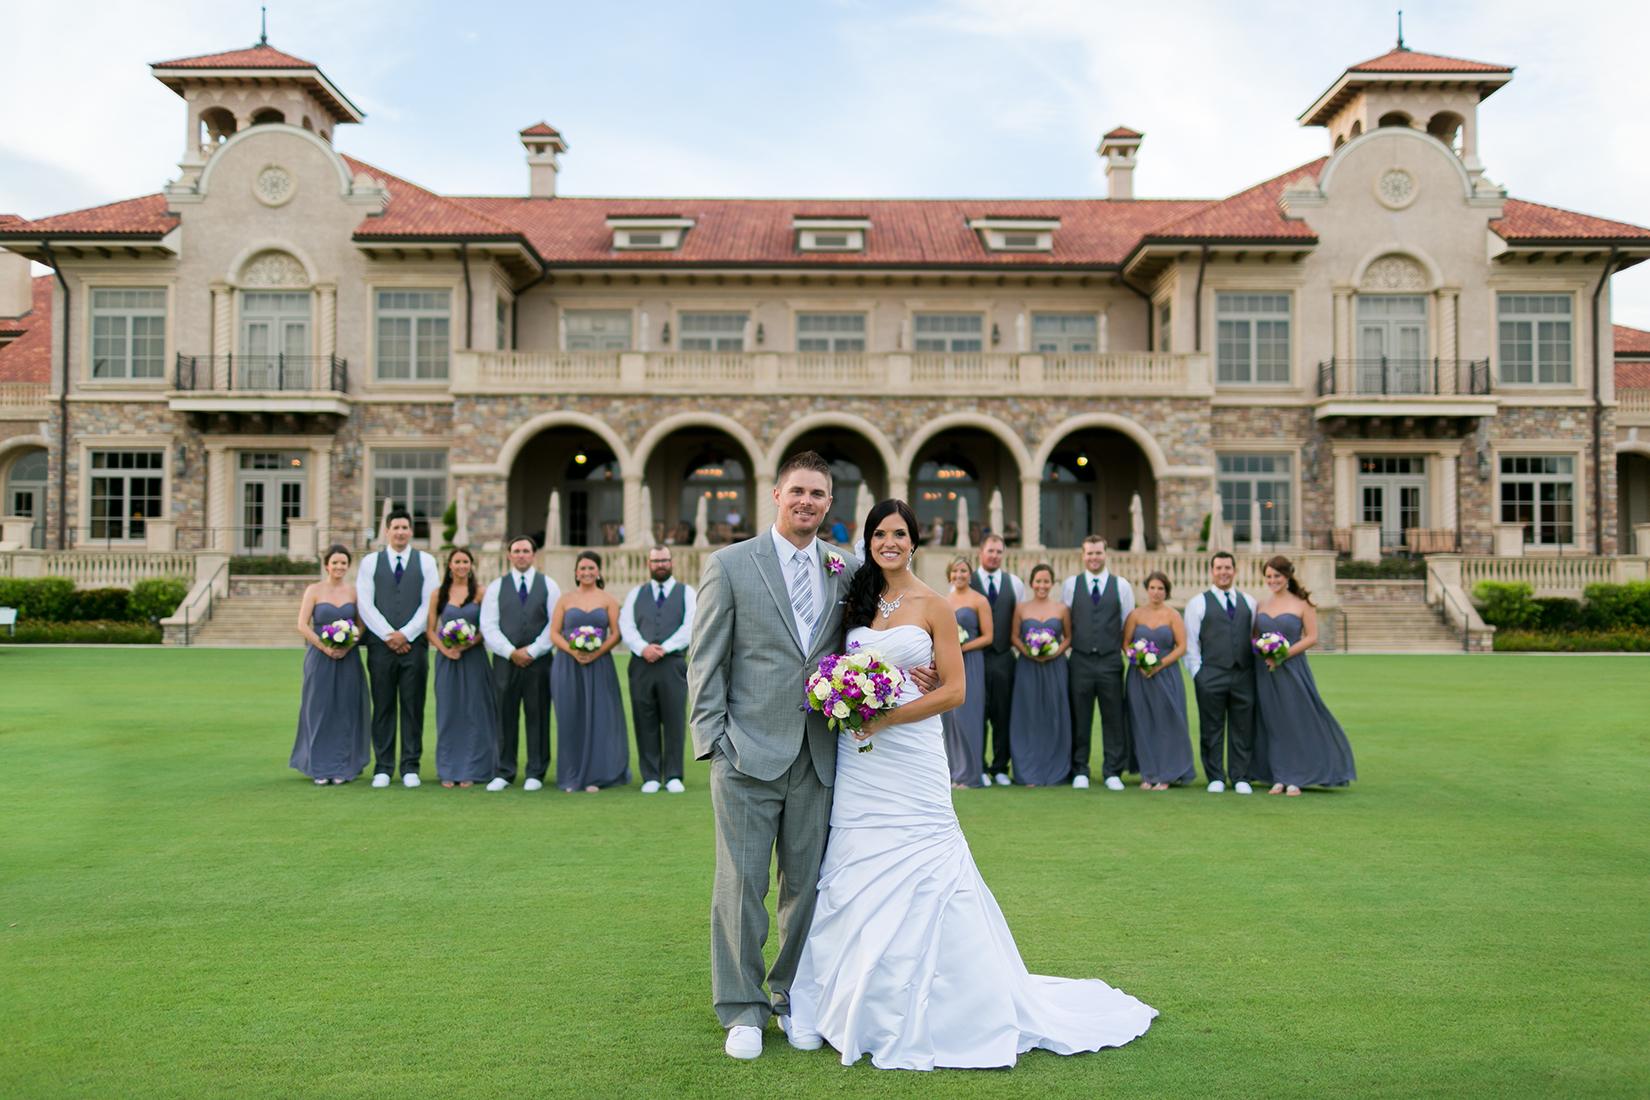 adam-szarmack-tpc-sawgrass-ponte-vedra-wedding-photographer-PZ3A9682.jpg